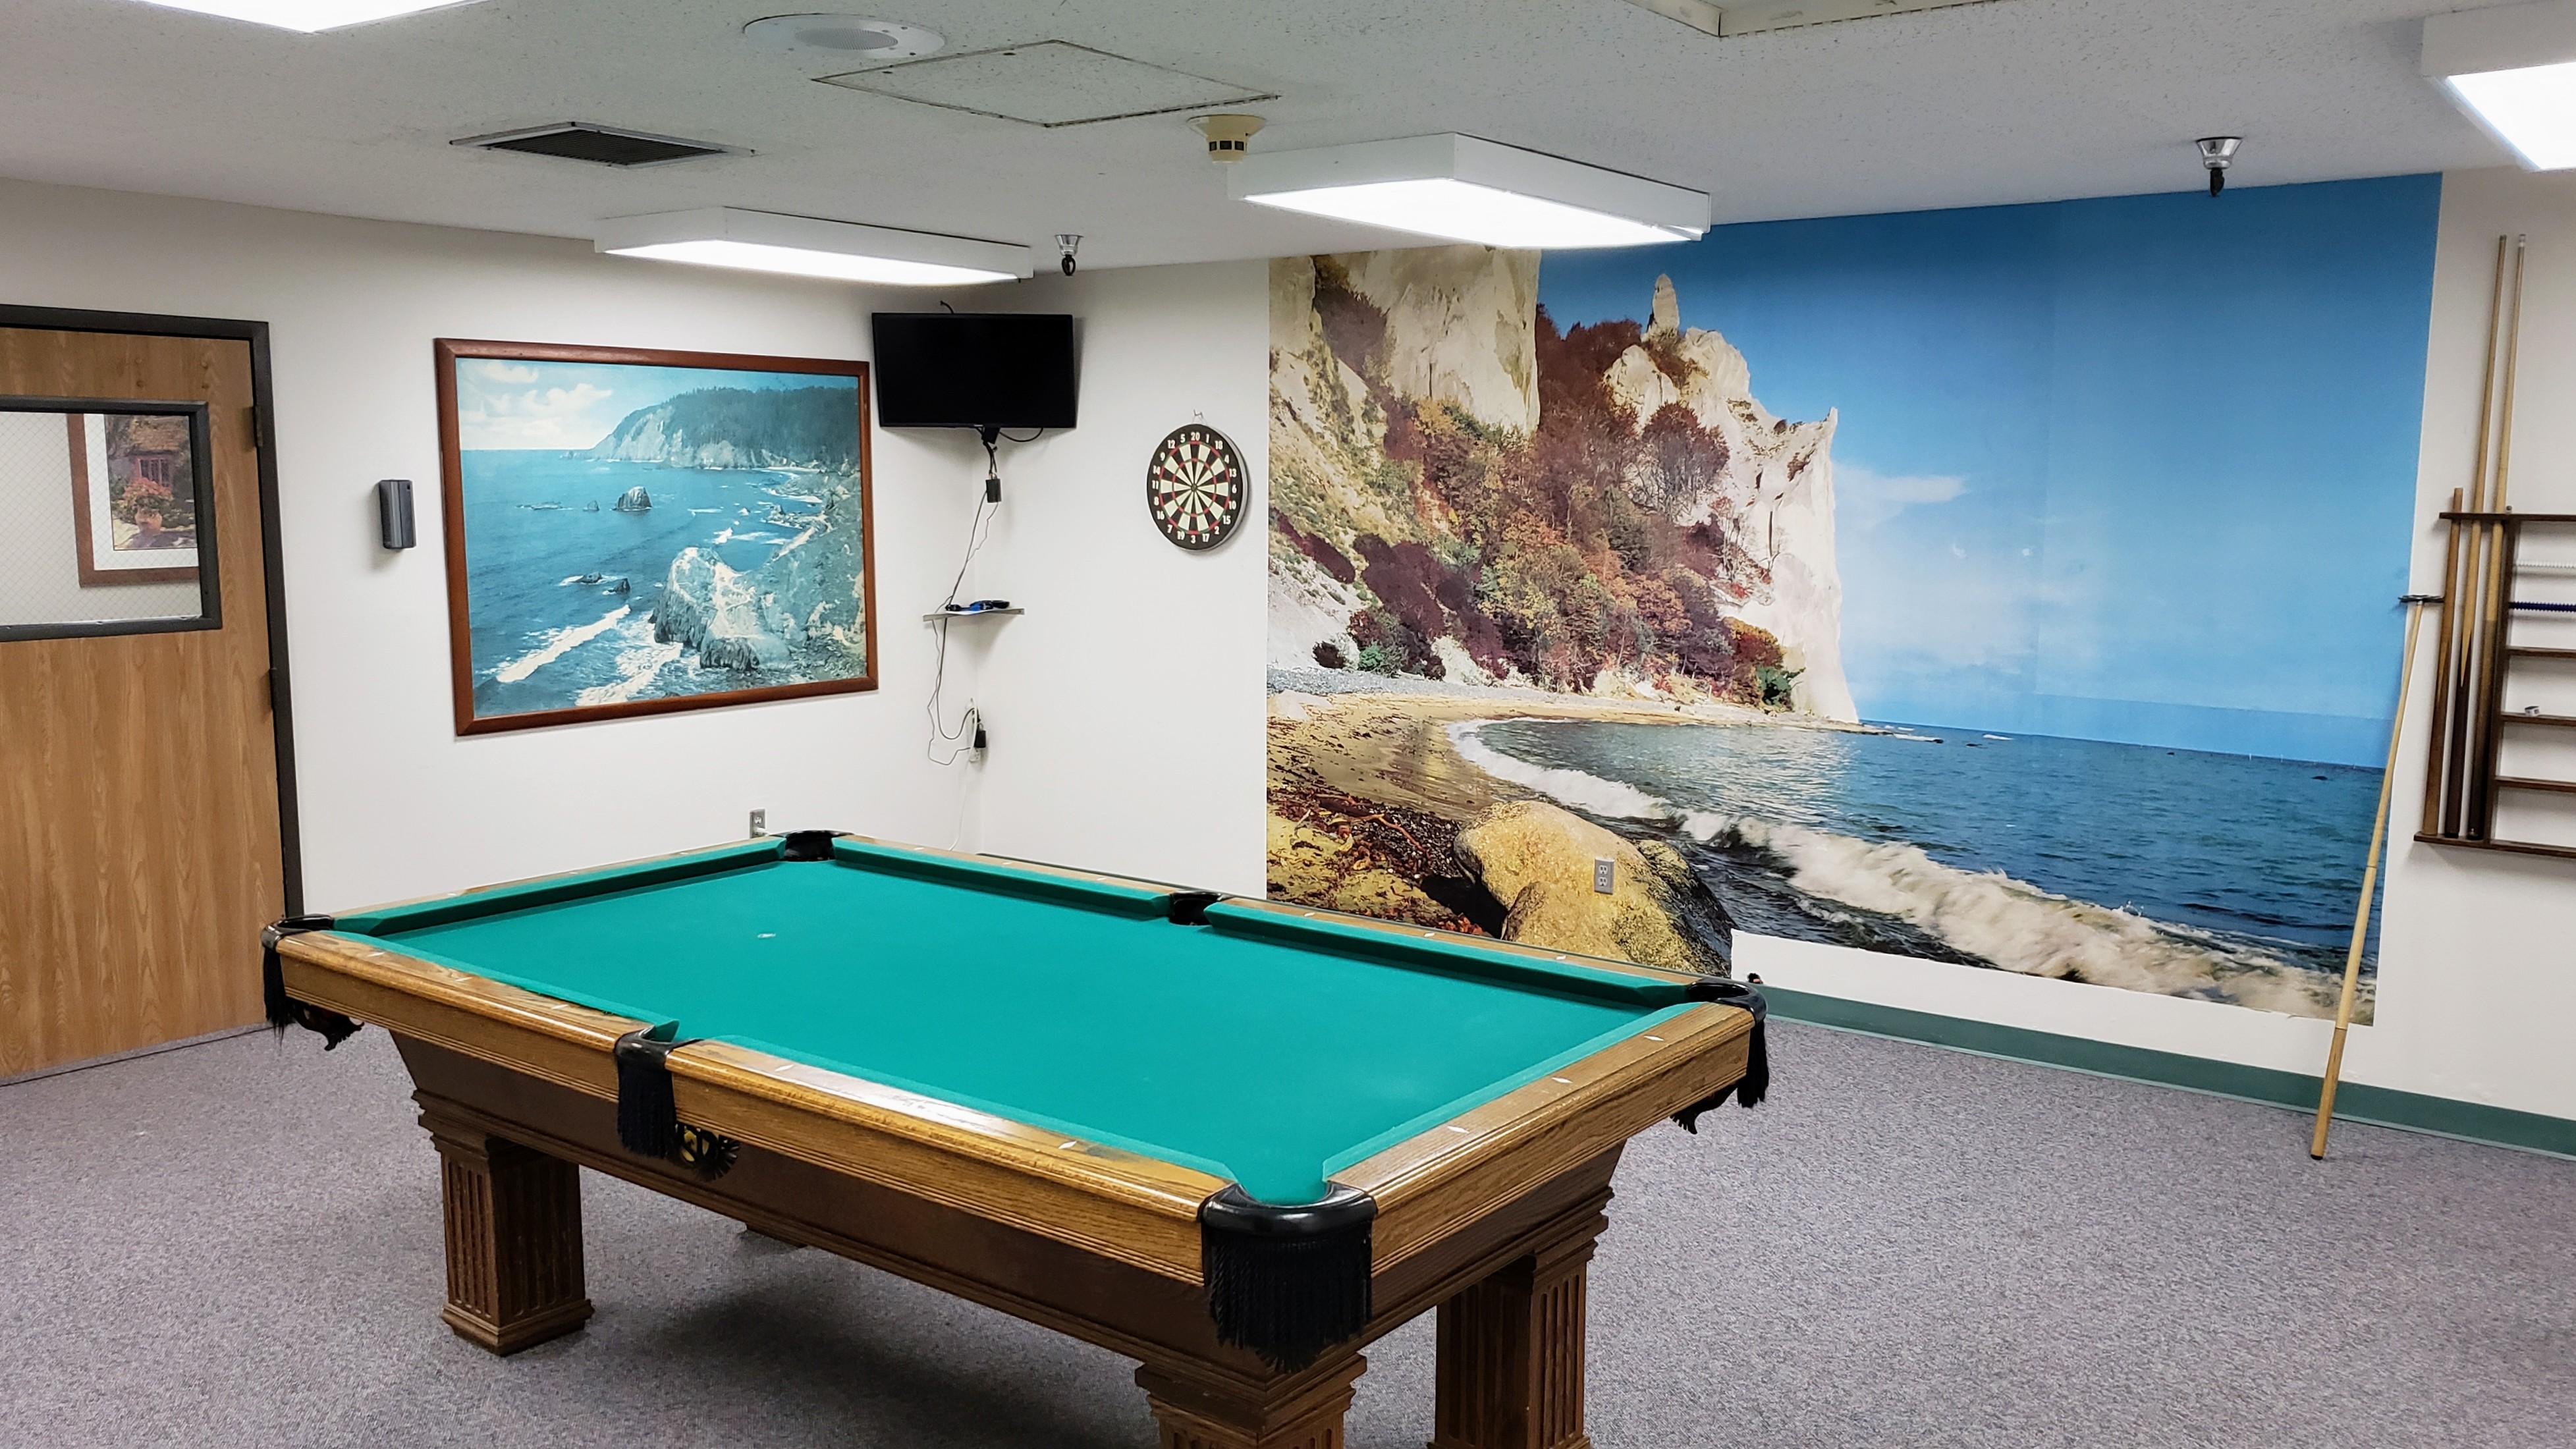 Beachwood game room